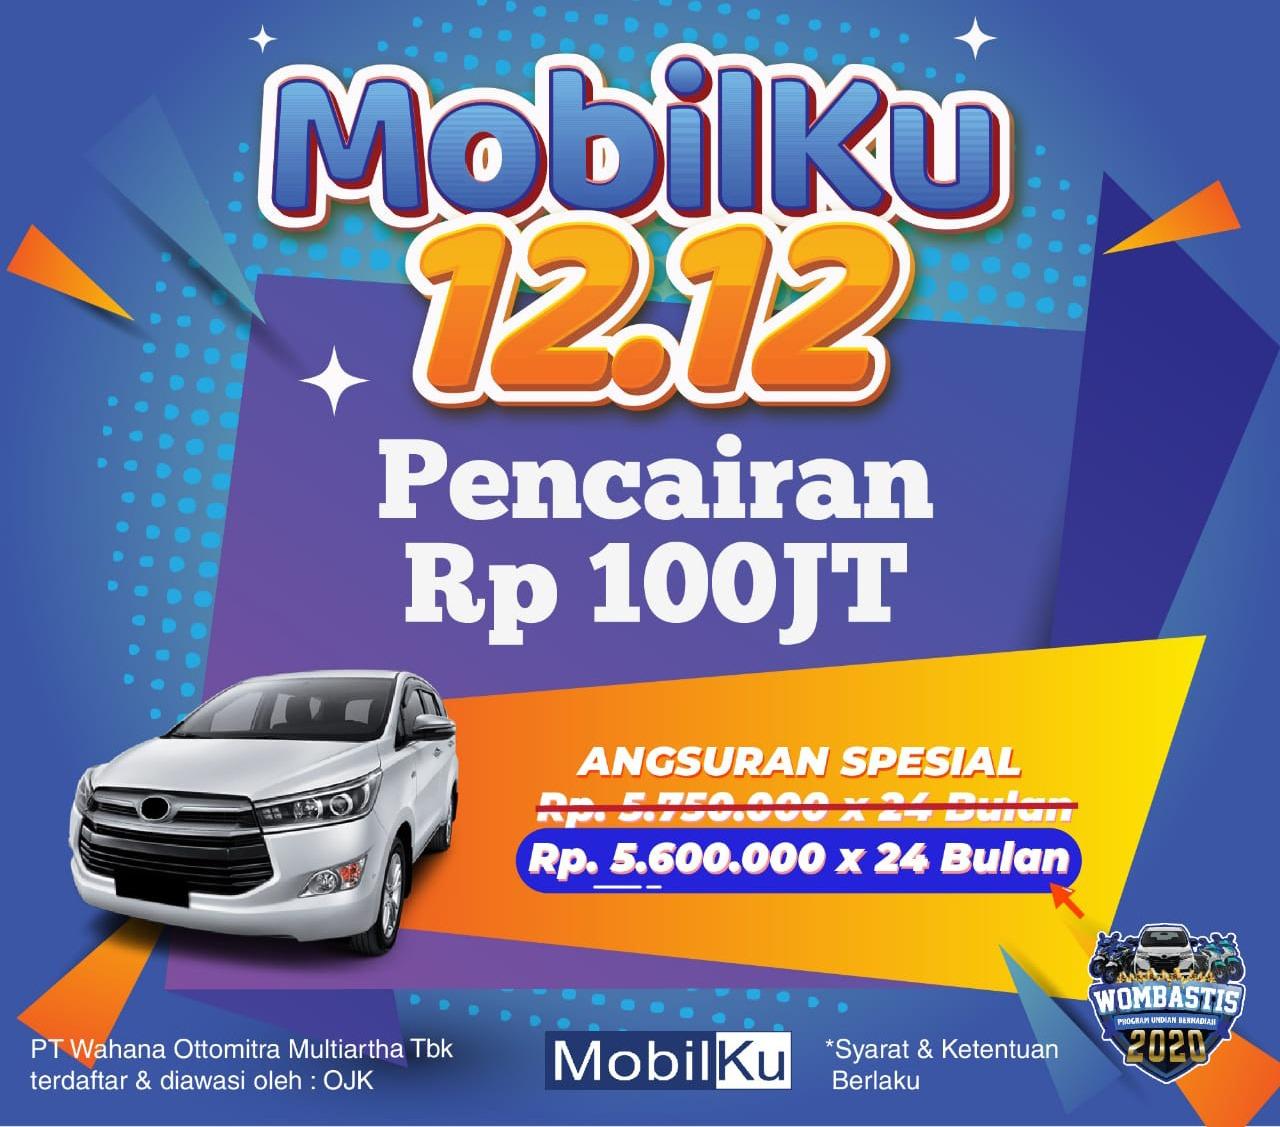 Simulasi Gadai BPKB Mobil Proses Langsung Cair di Bandung ...